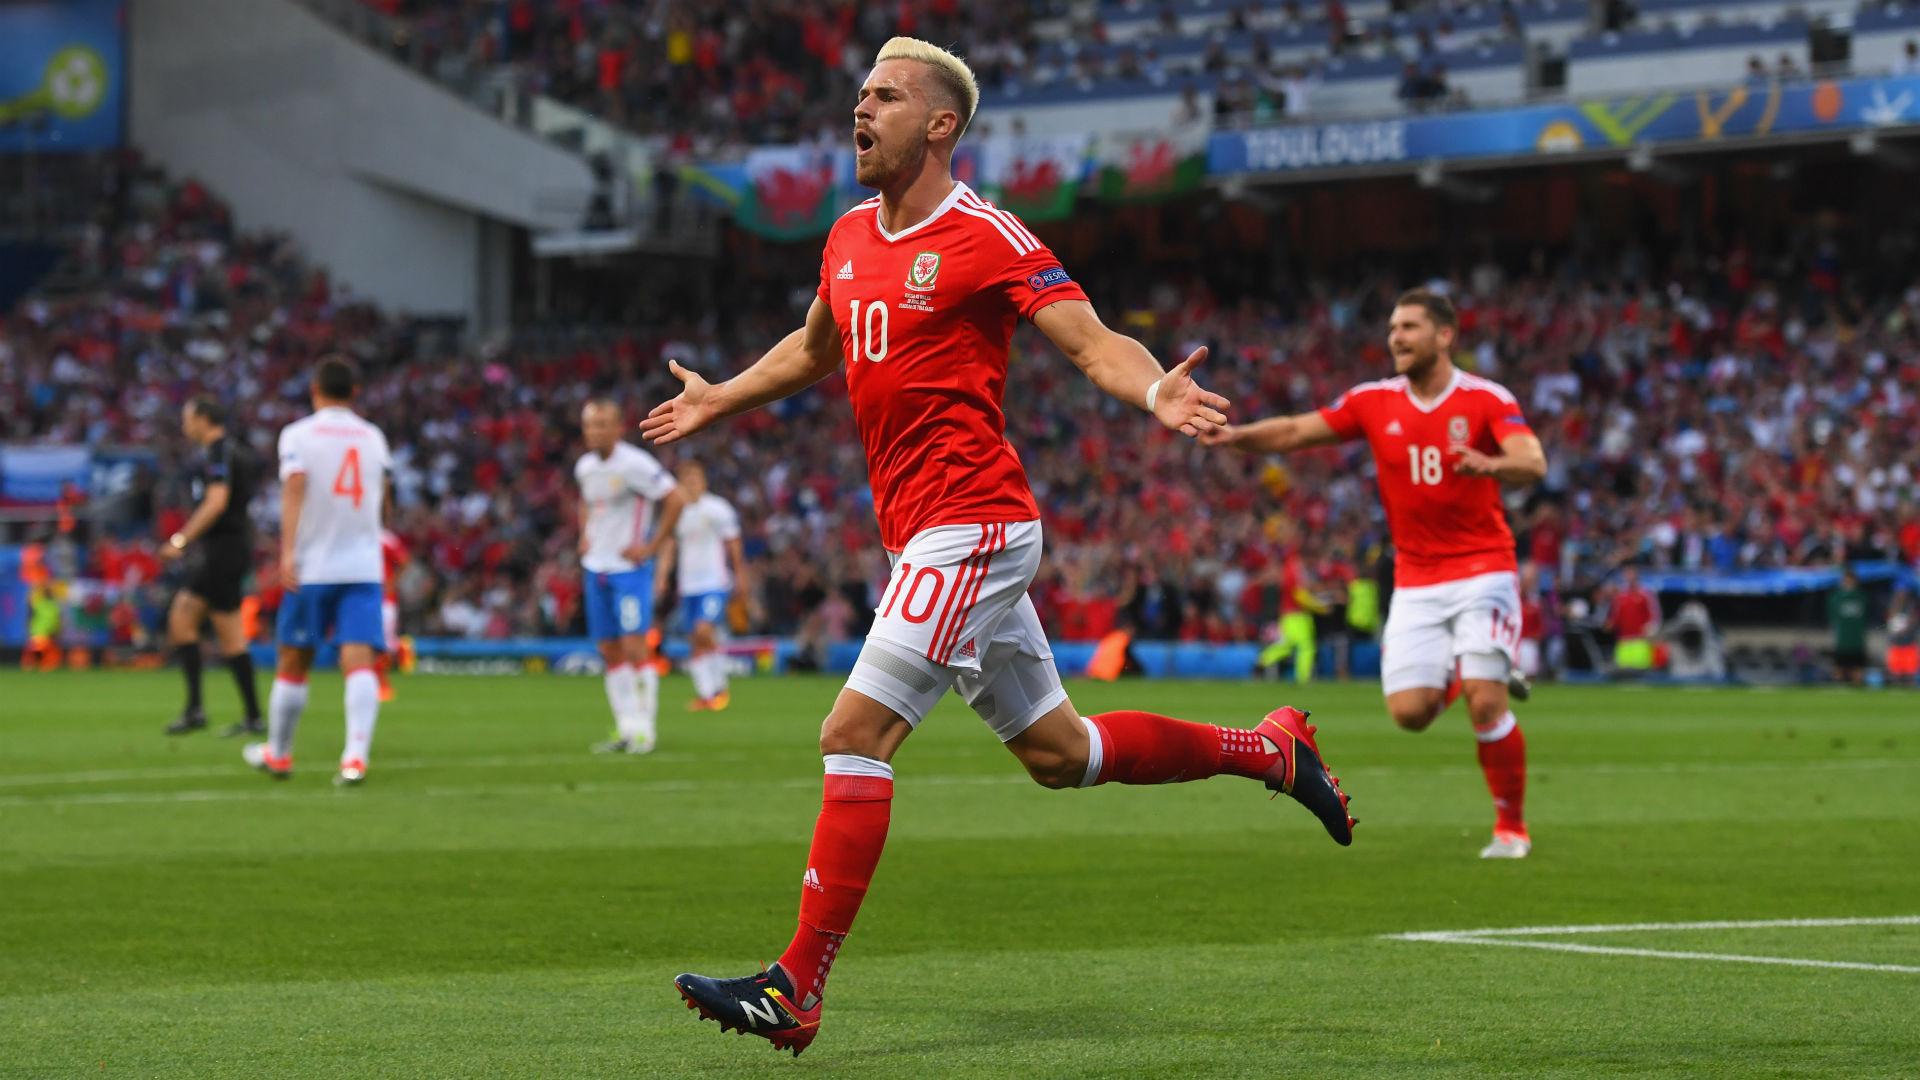 Aaron Ramsey Euro 2016 Wales v Russia